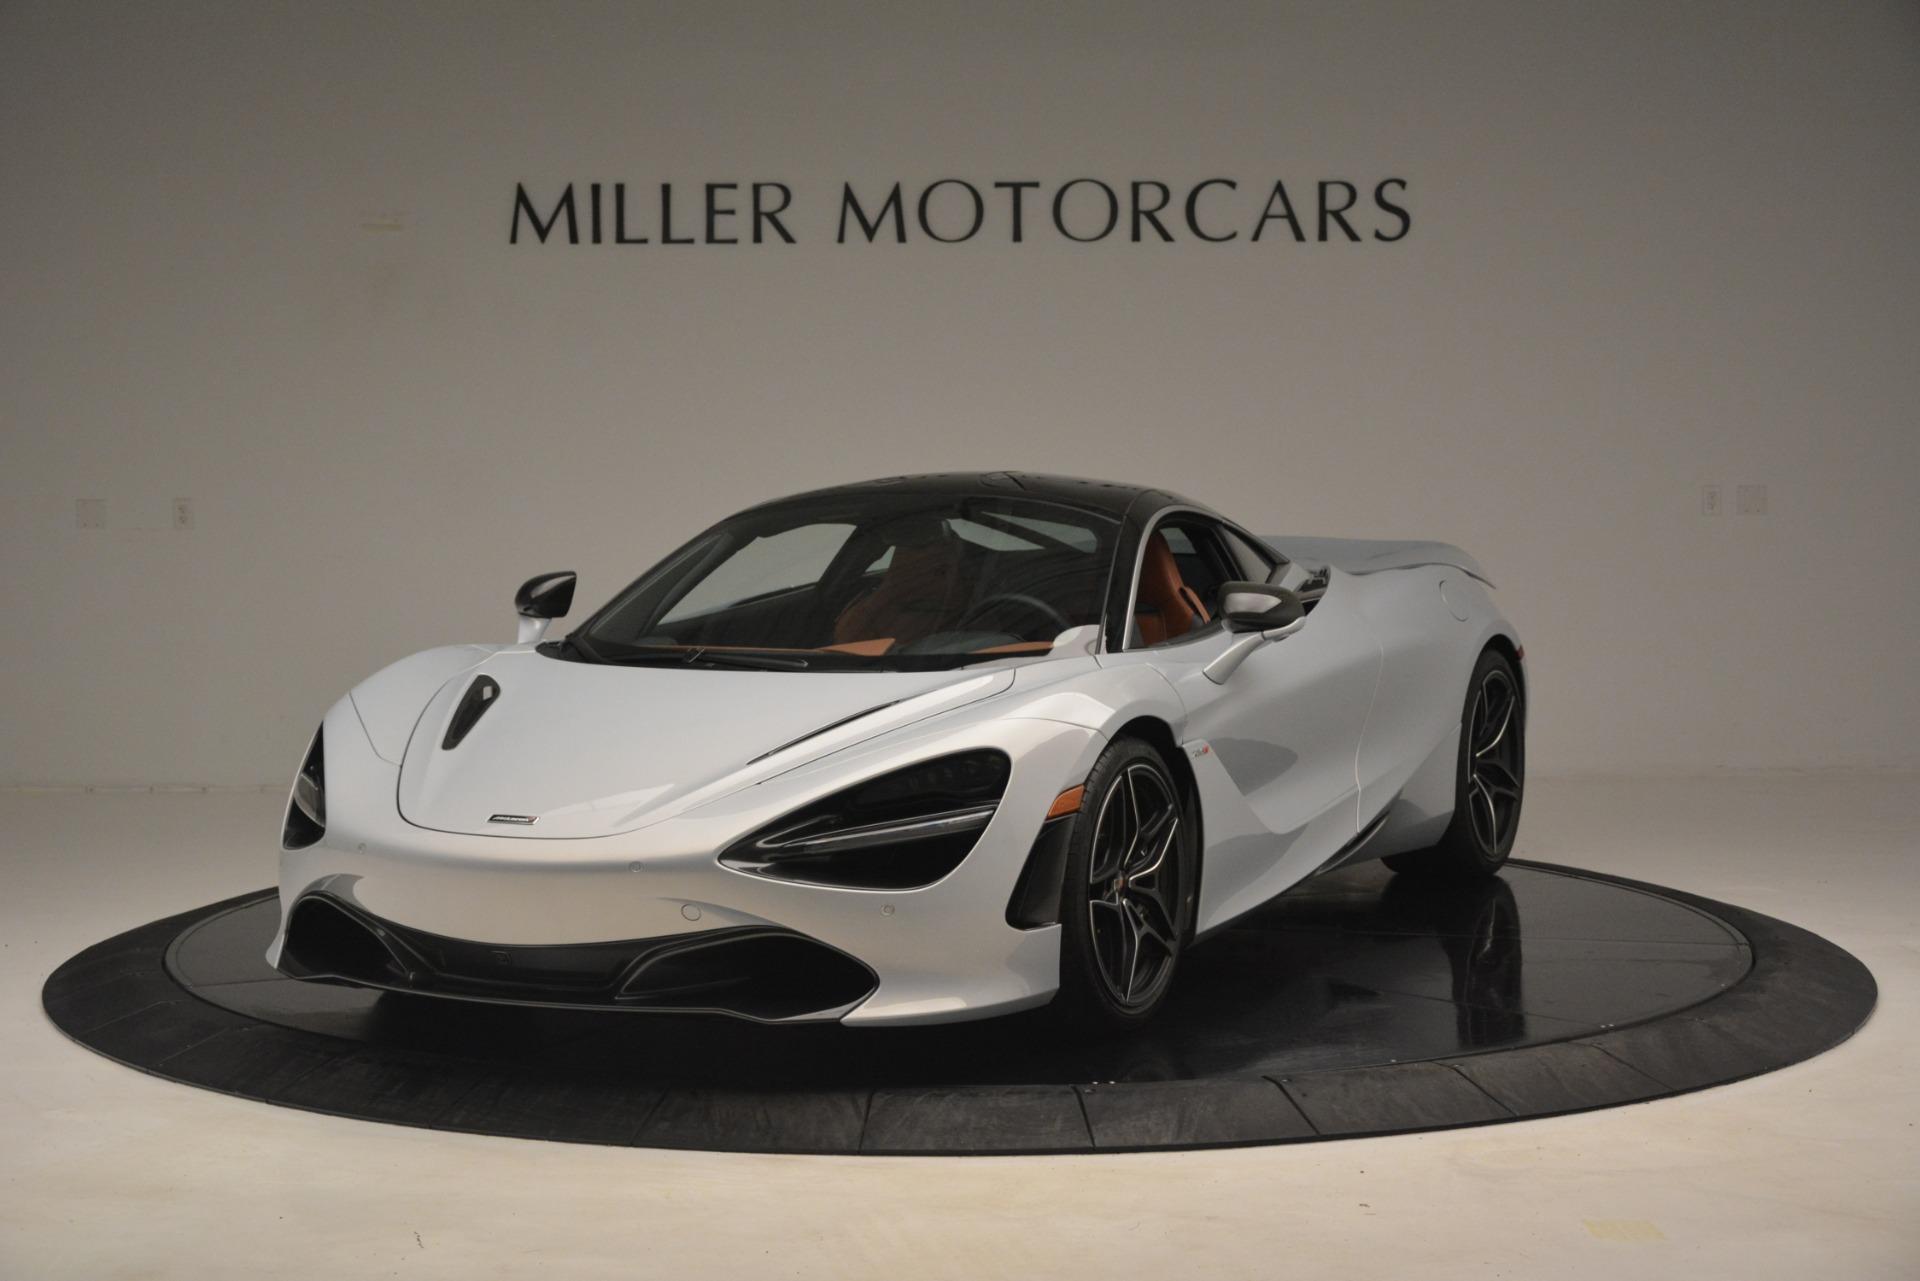 Used 2018 McLaren 720S Coupe For Sale In Westport, CT 3157_p2